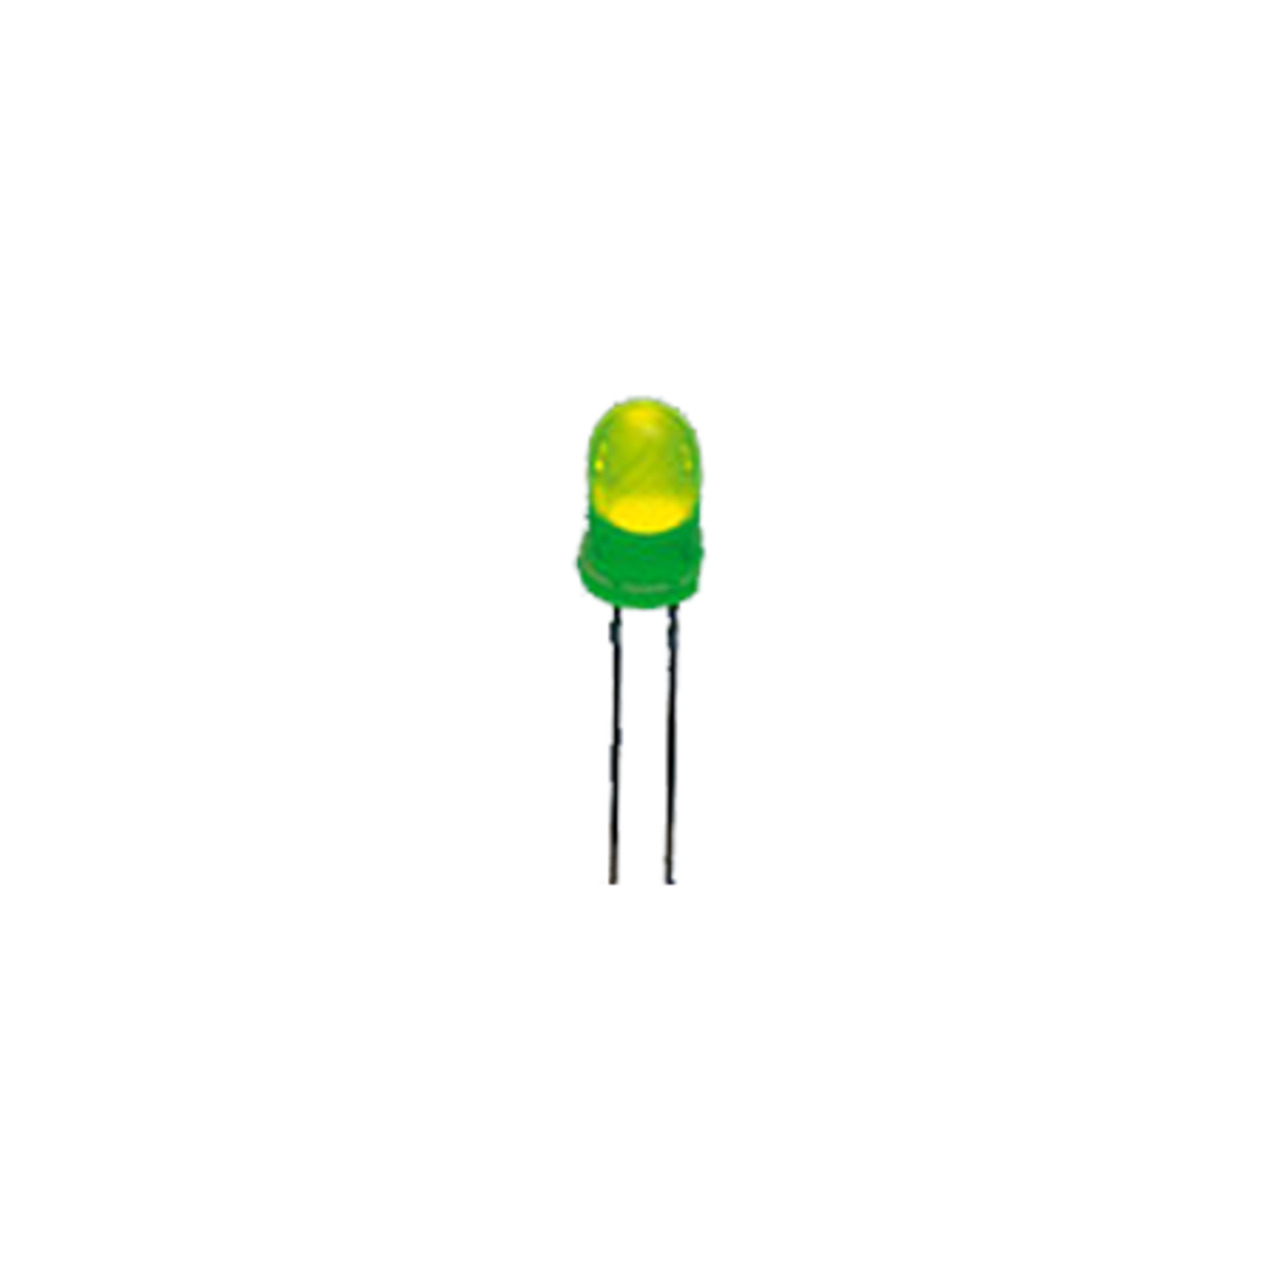 Superhelle 5 mm LED- Grün- 6-000 mcd- 10er-Pack